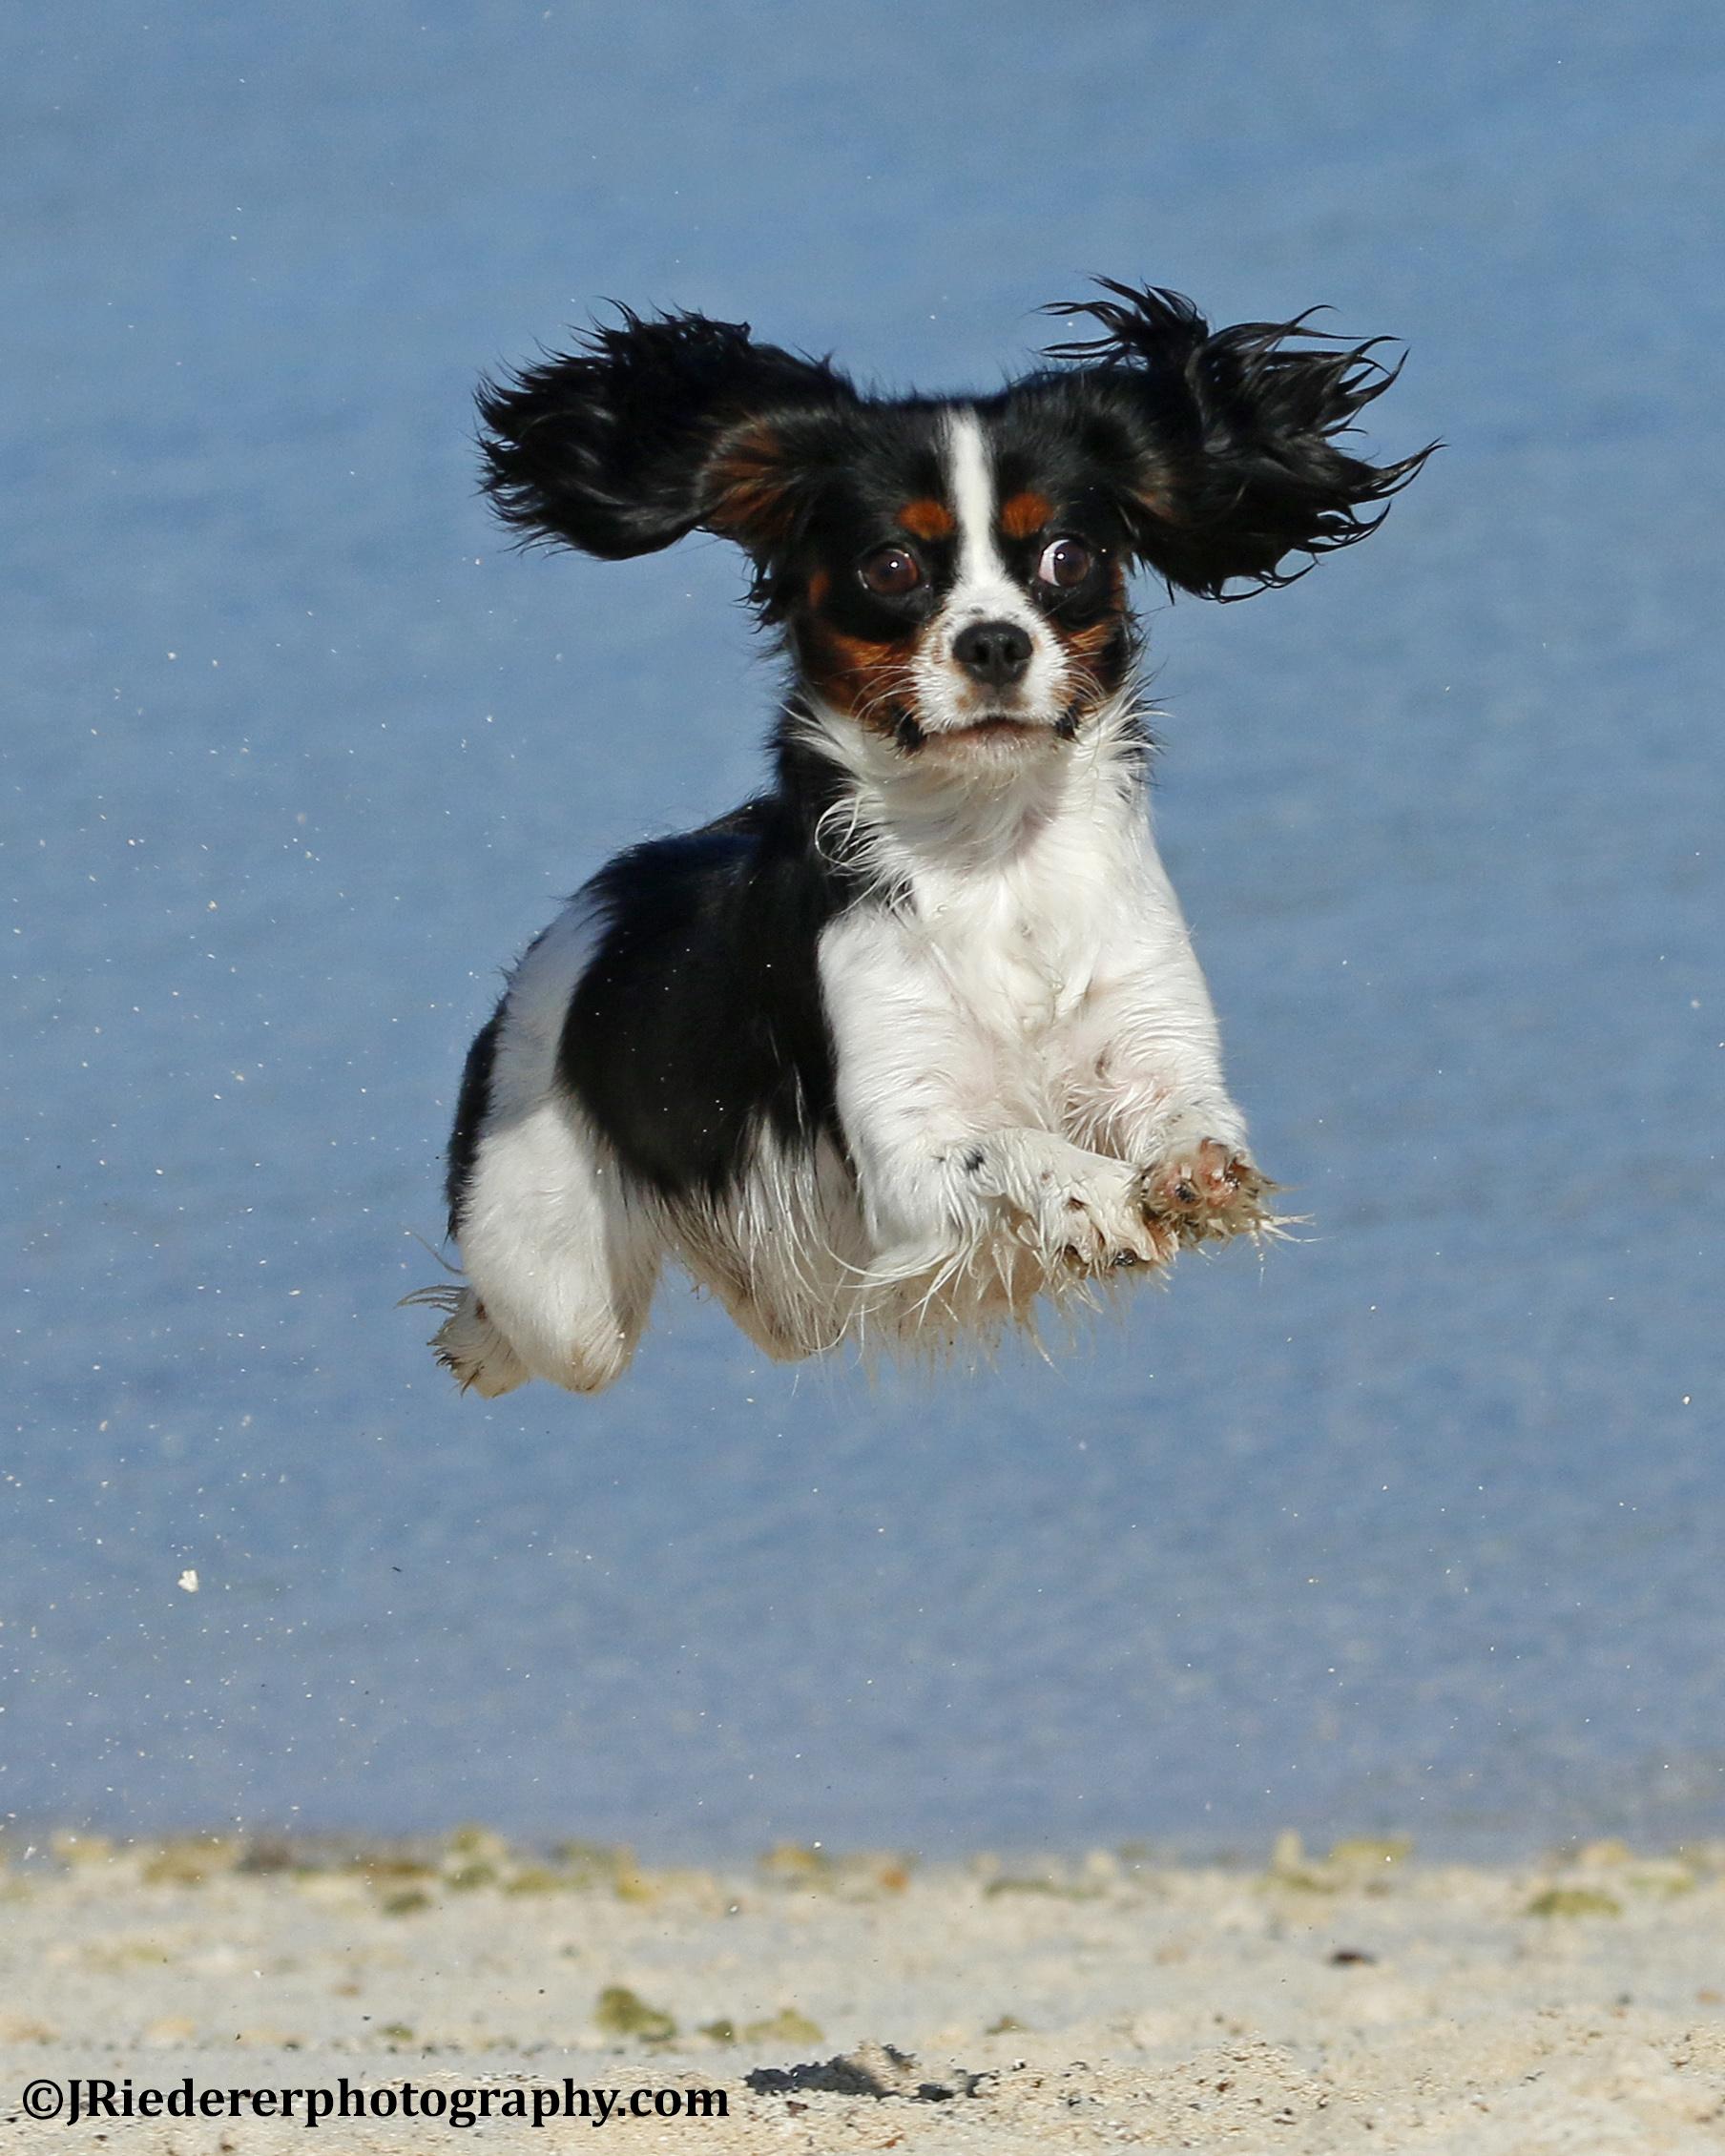 Puppy Play